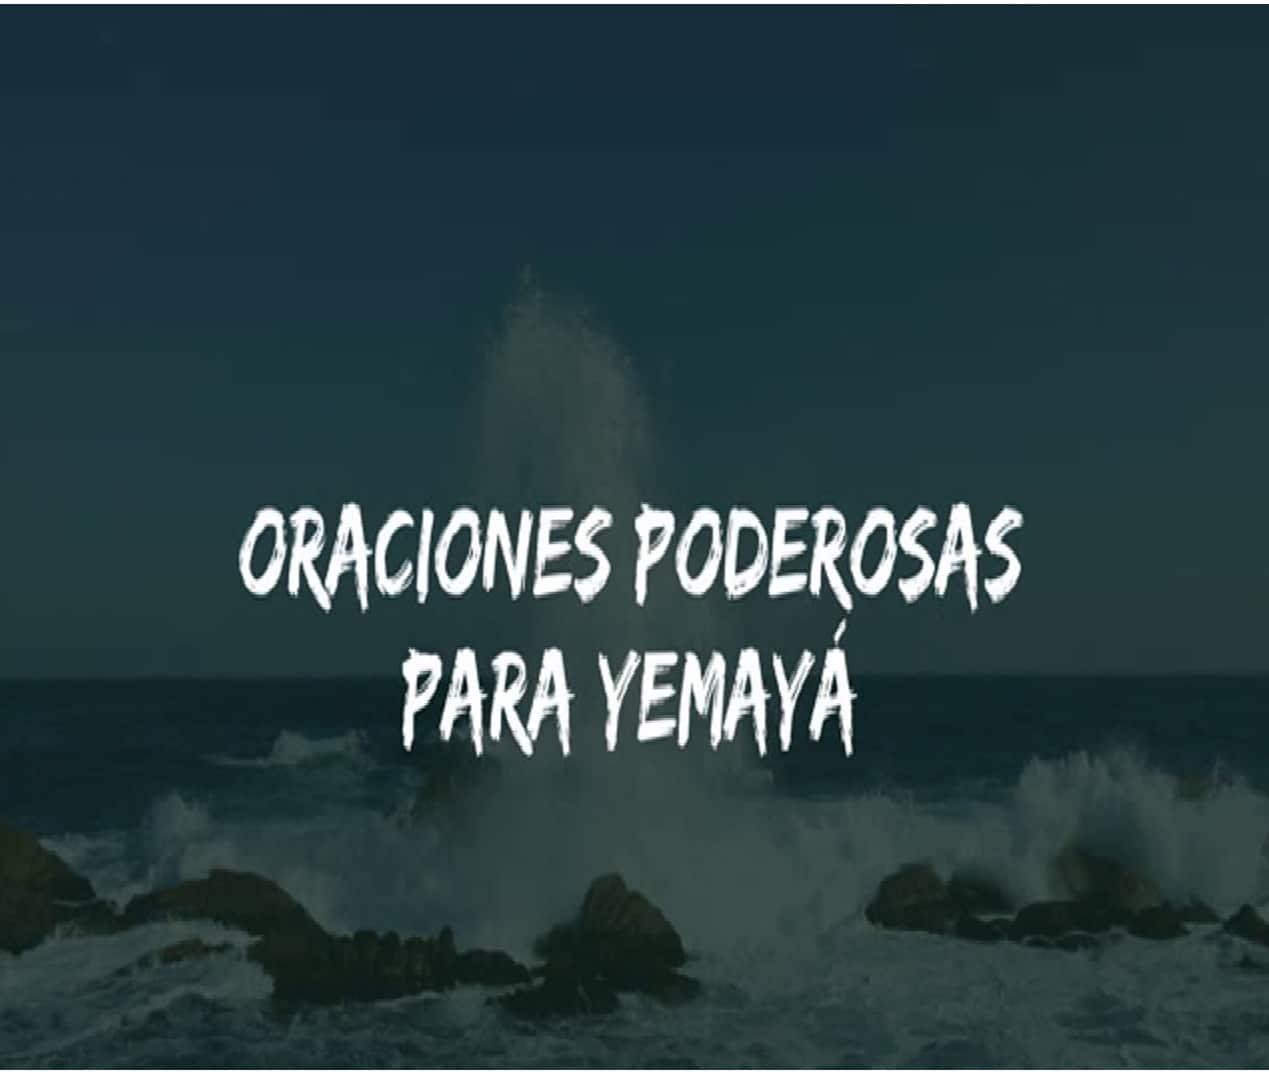 Oración a Yemayá